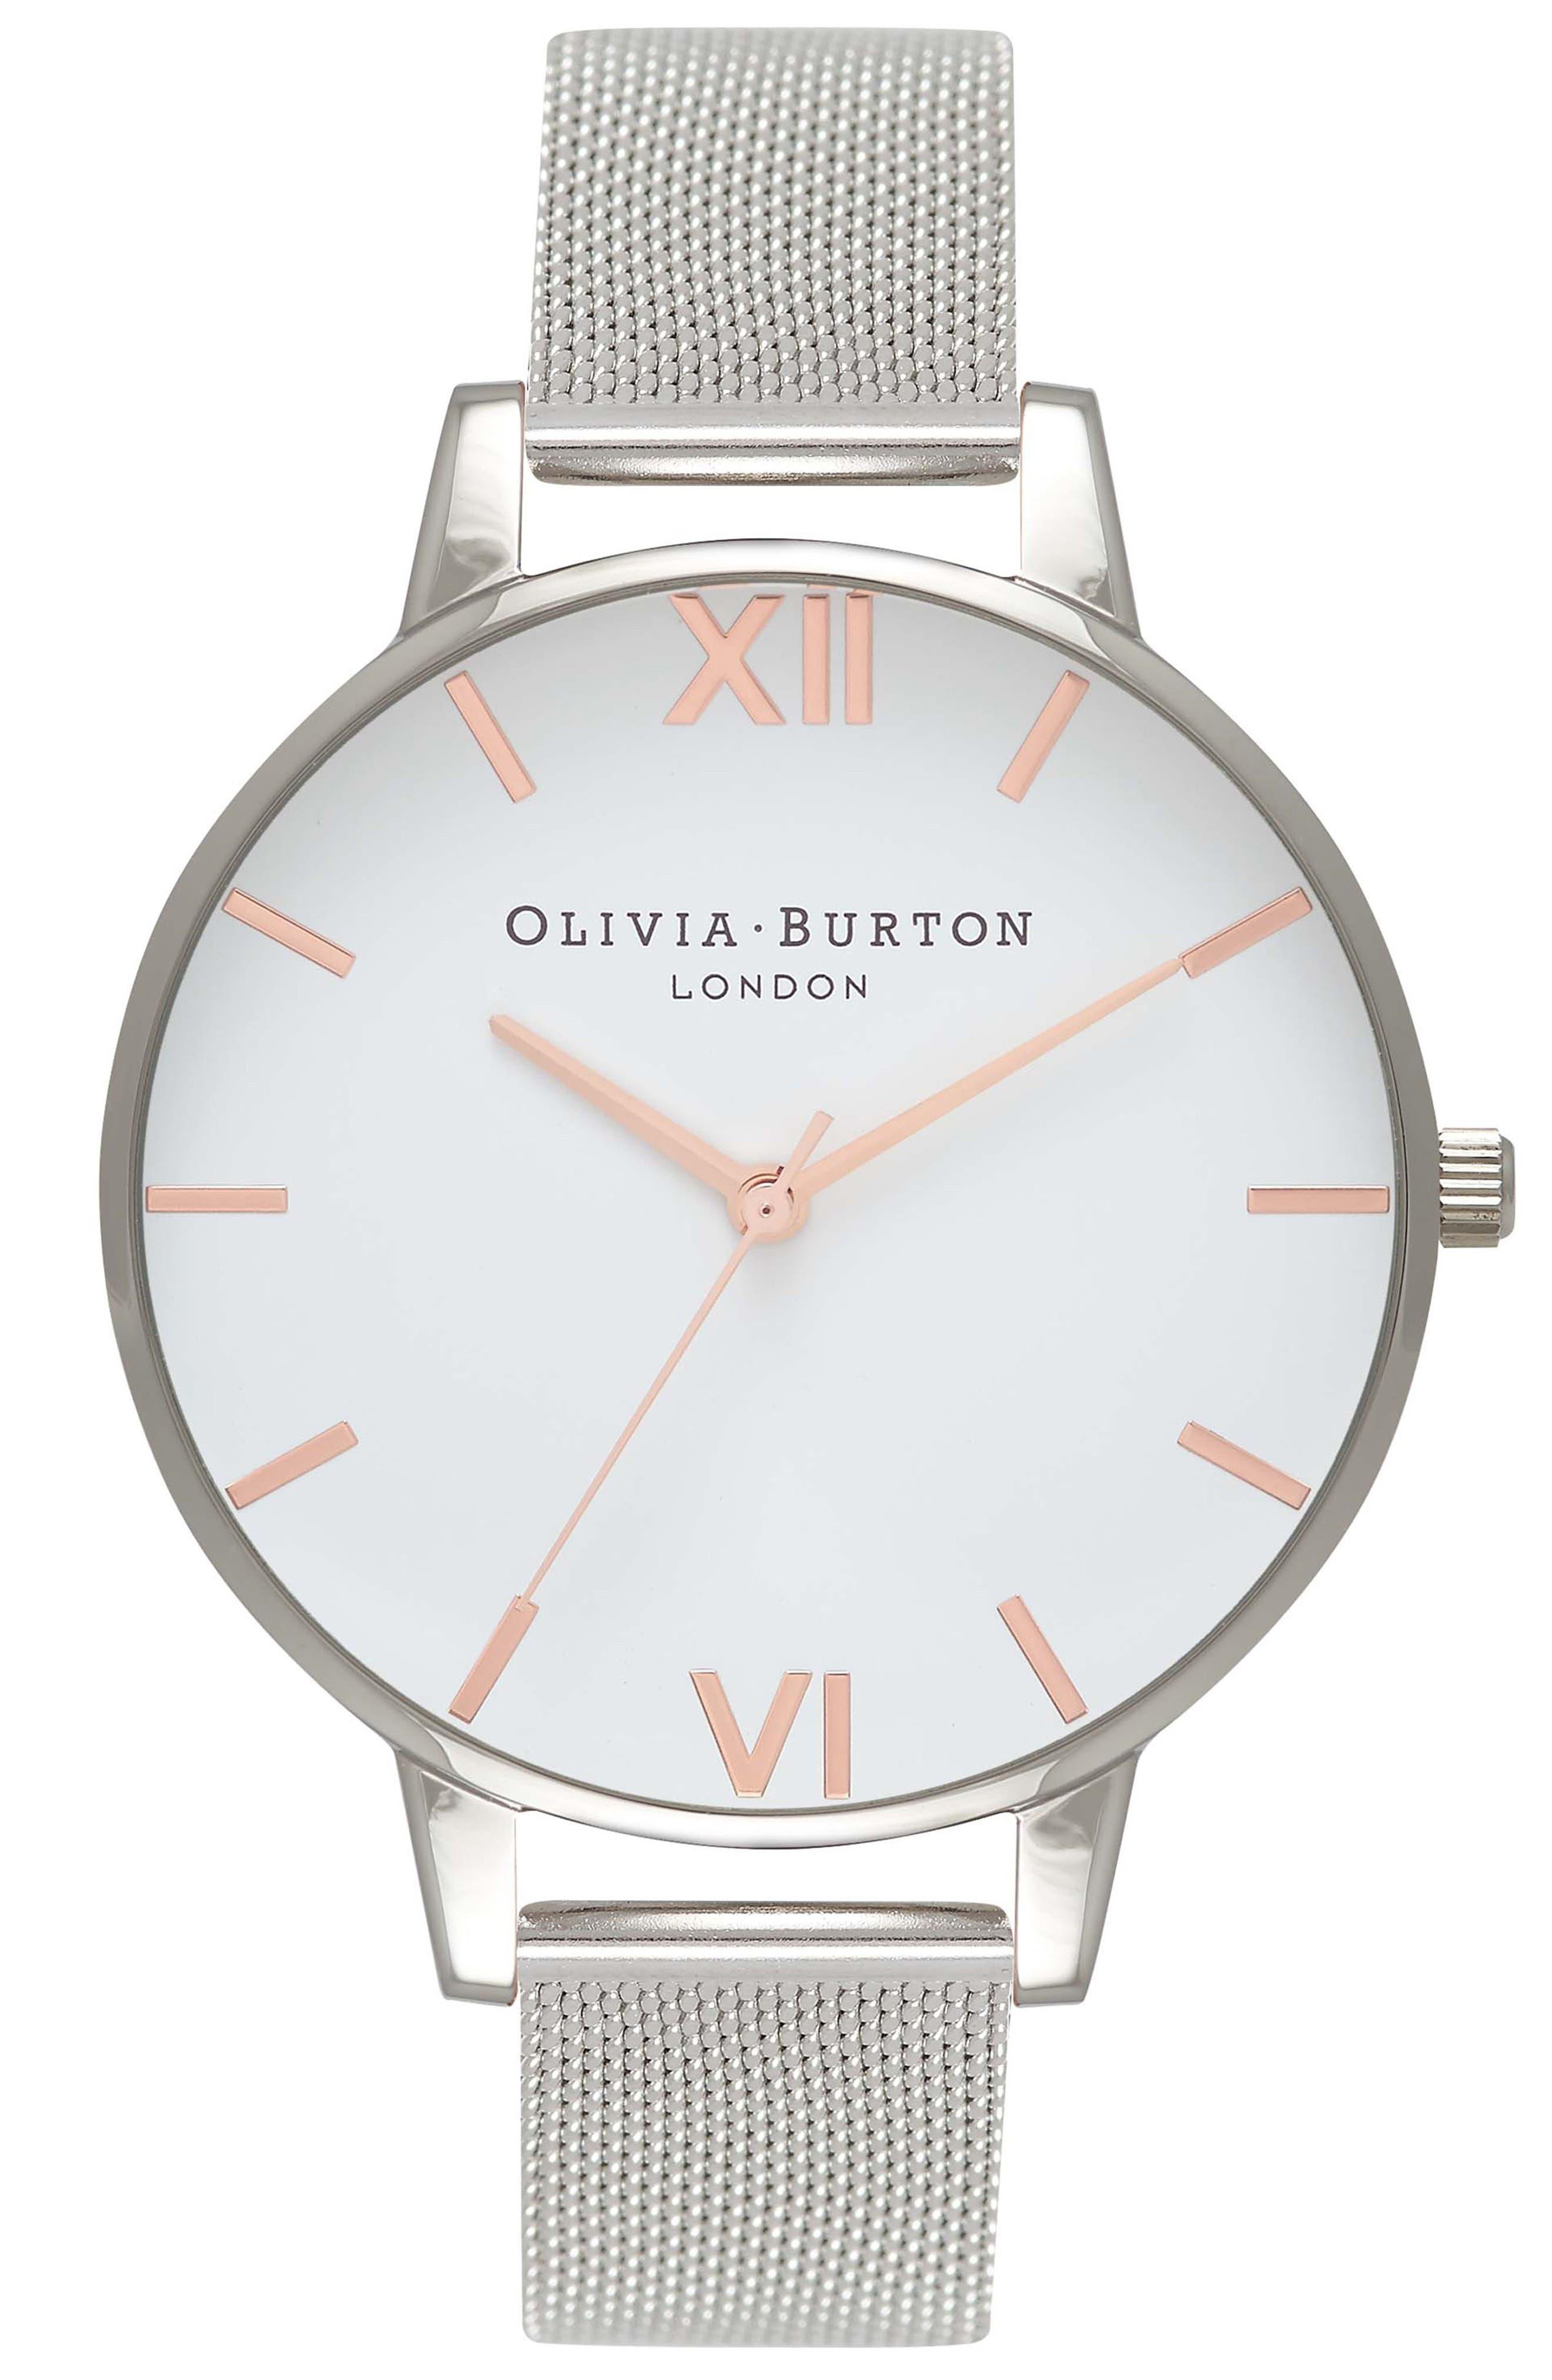 OLIVIA BURTON Mesh Strap Watch, 38mm, Main, color, SILVER/ WHITE/ ROSE GOLD